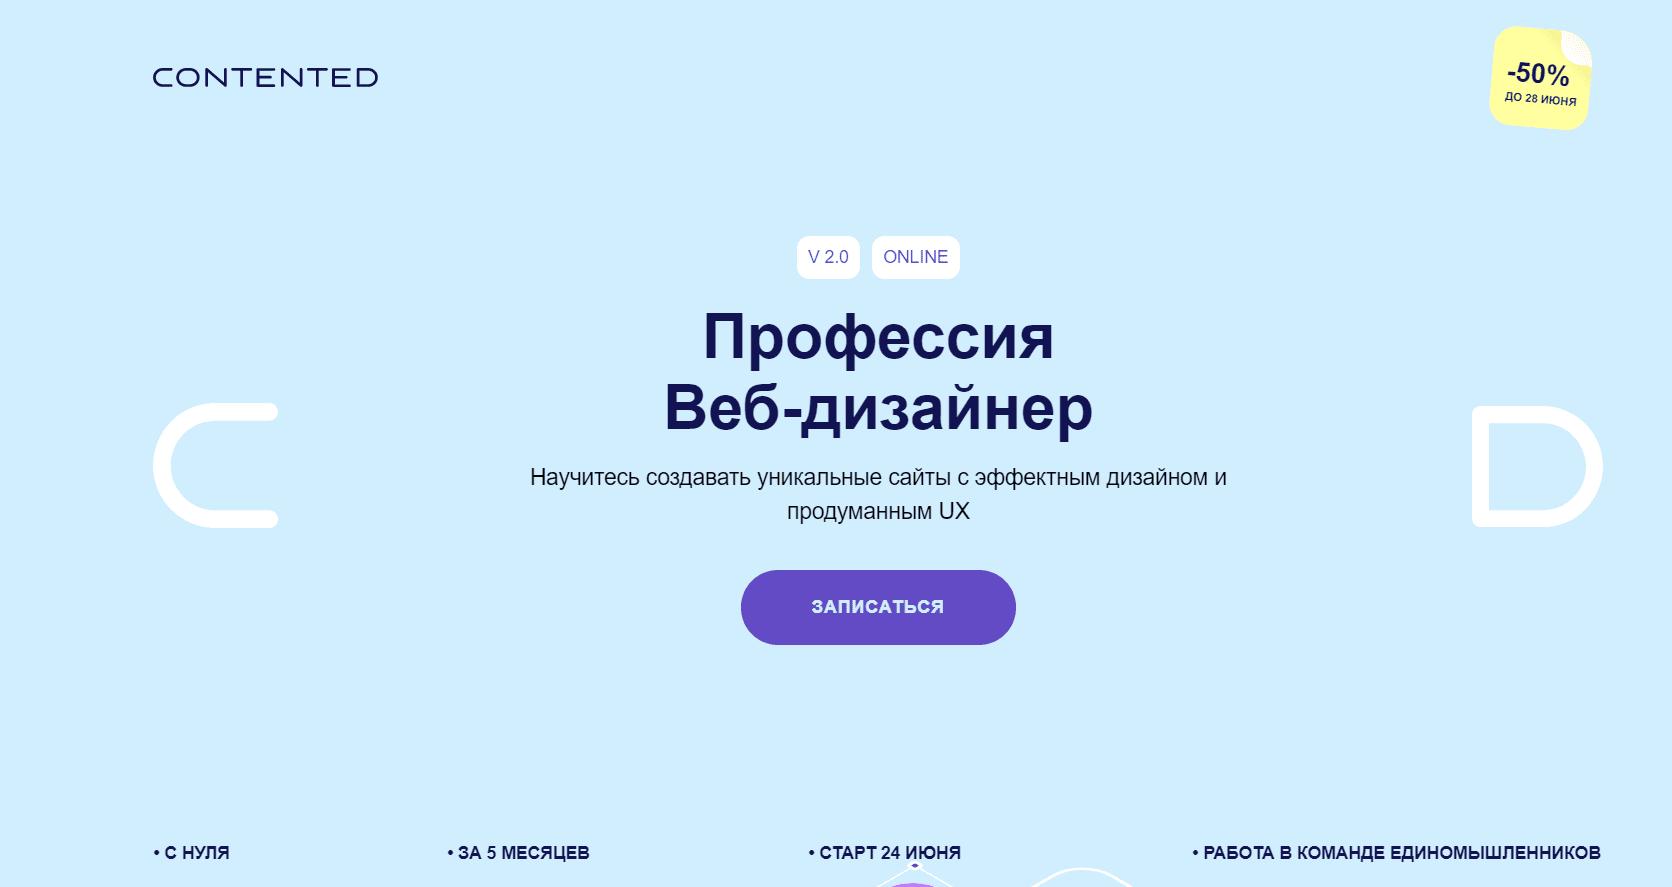 курсы по веб-дизайну